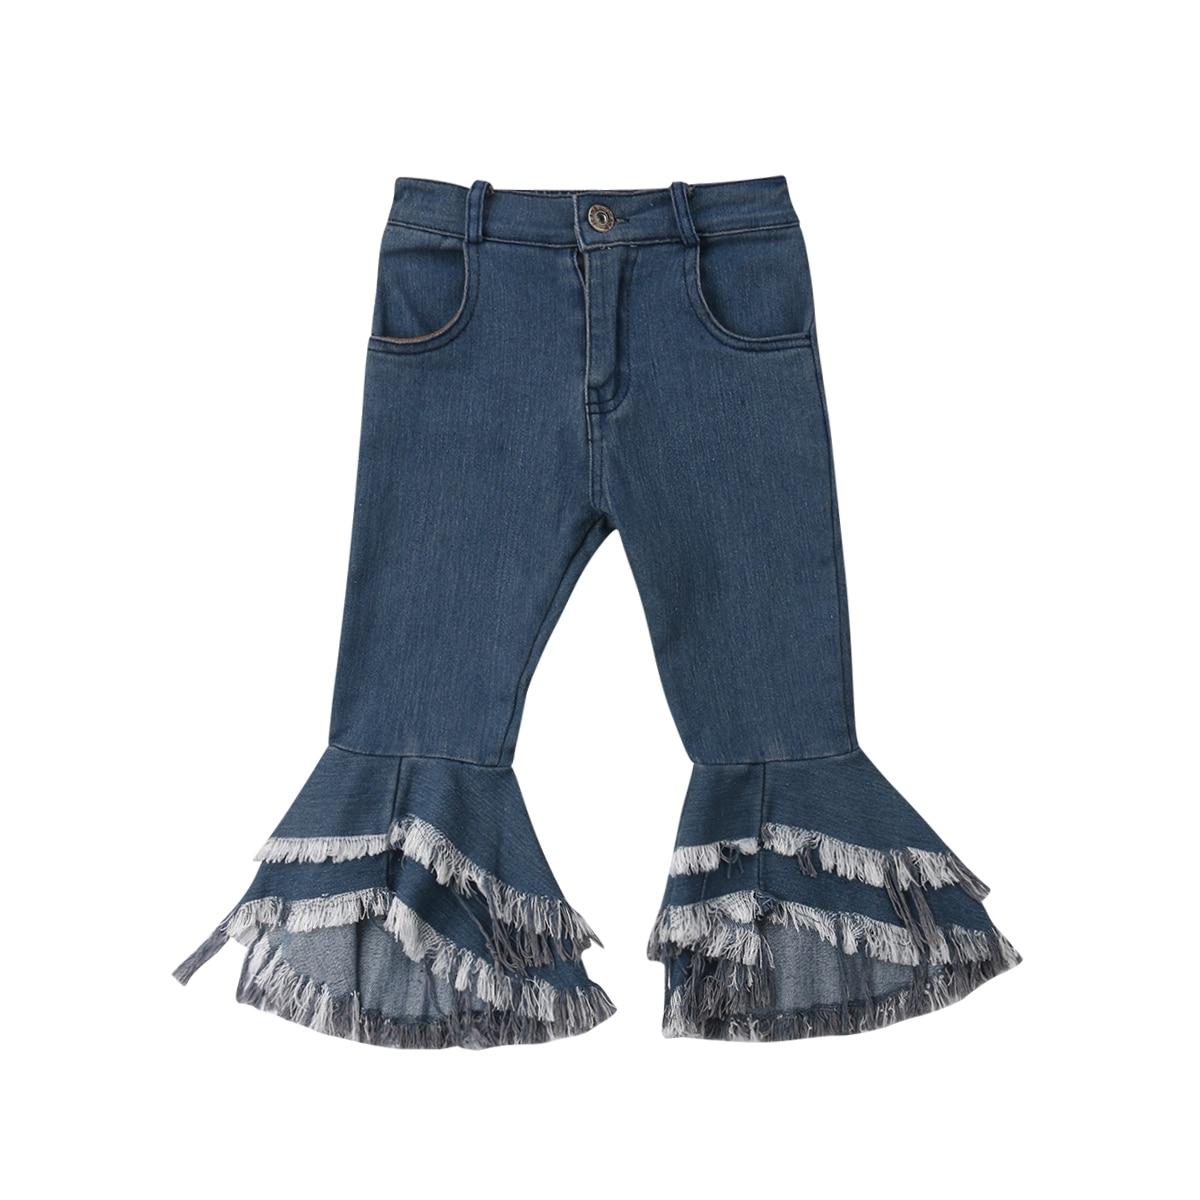 Niños flecos de niña bebé Jeans niño niñas Denim Flare pantalones Kawaii Jeans para niñas niños 2-7 años